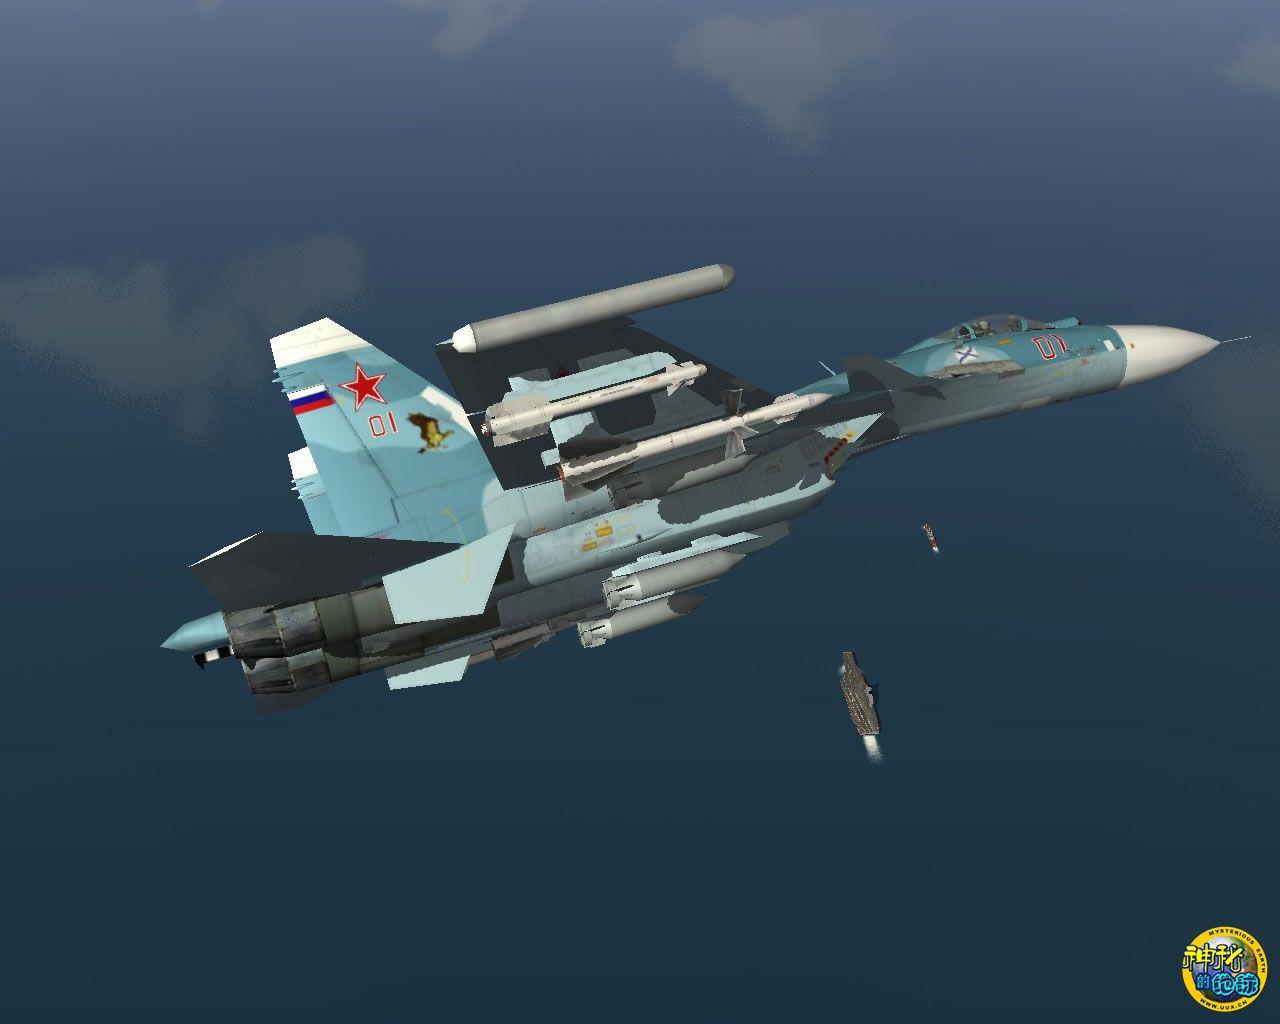 Su 33 (航空機)の画像 p1_22